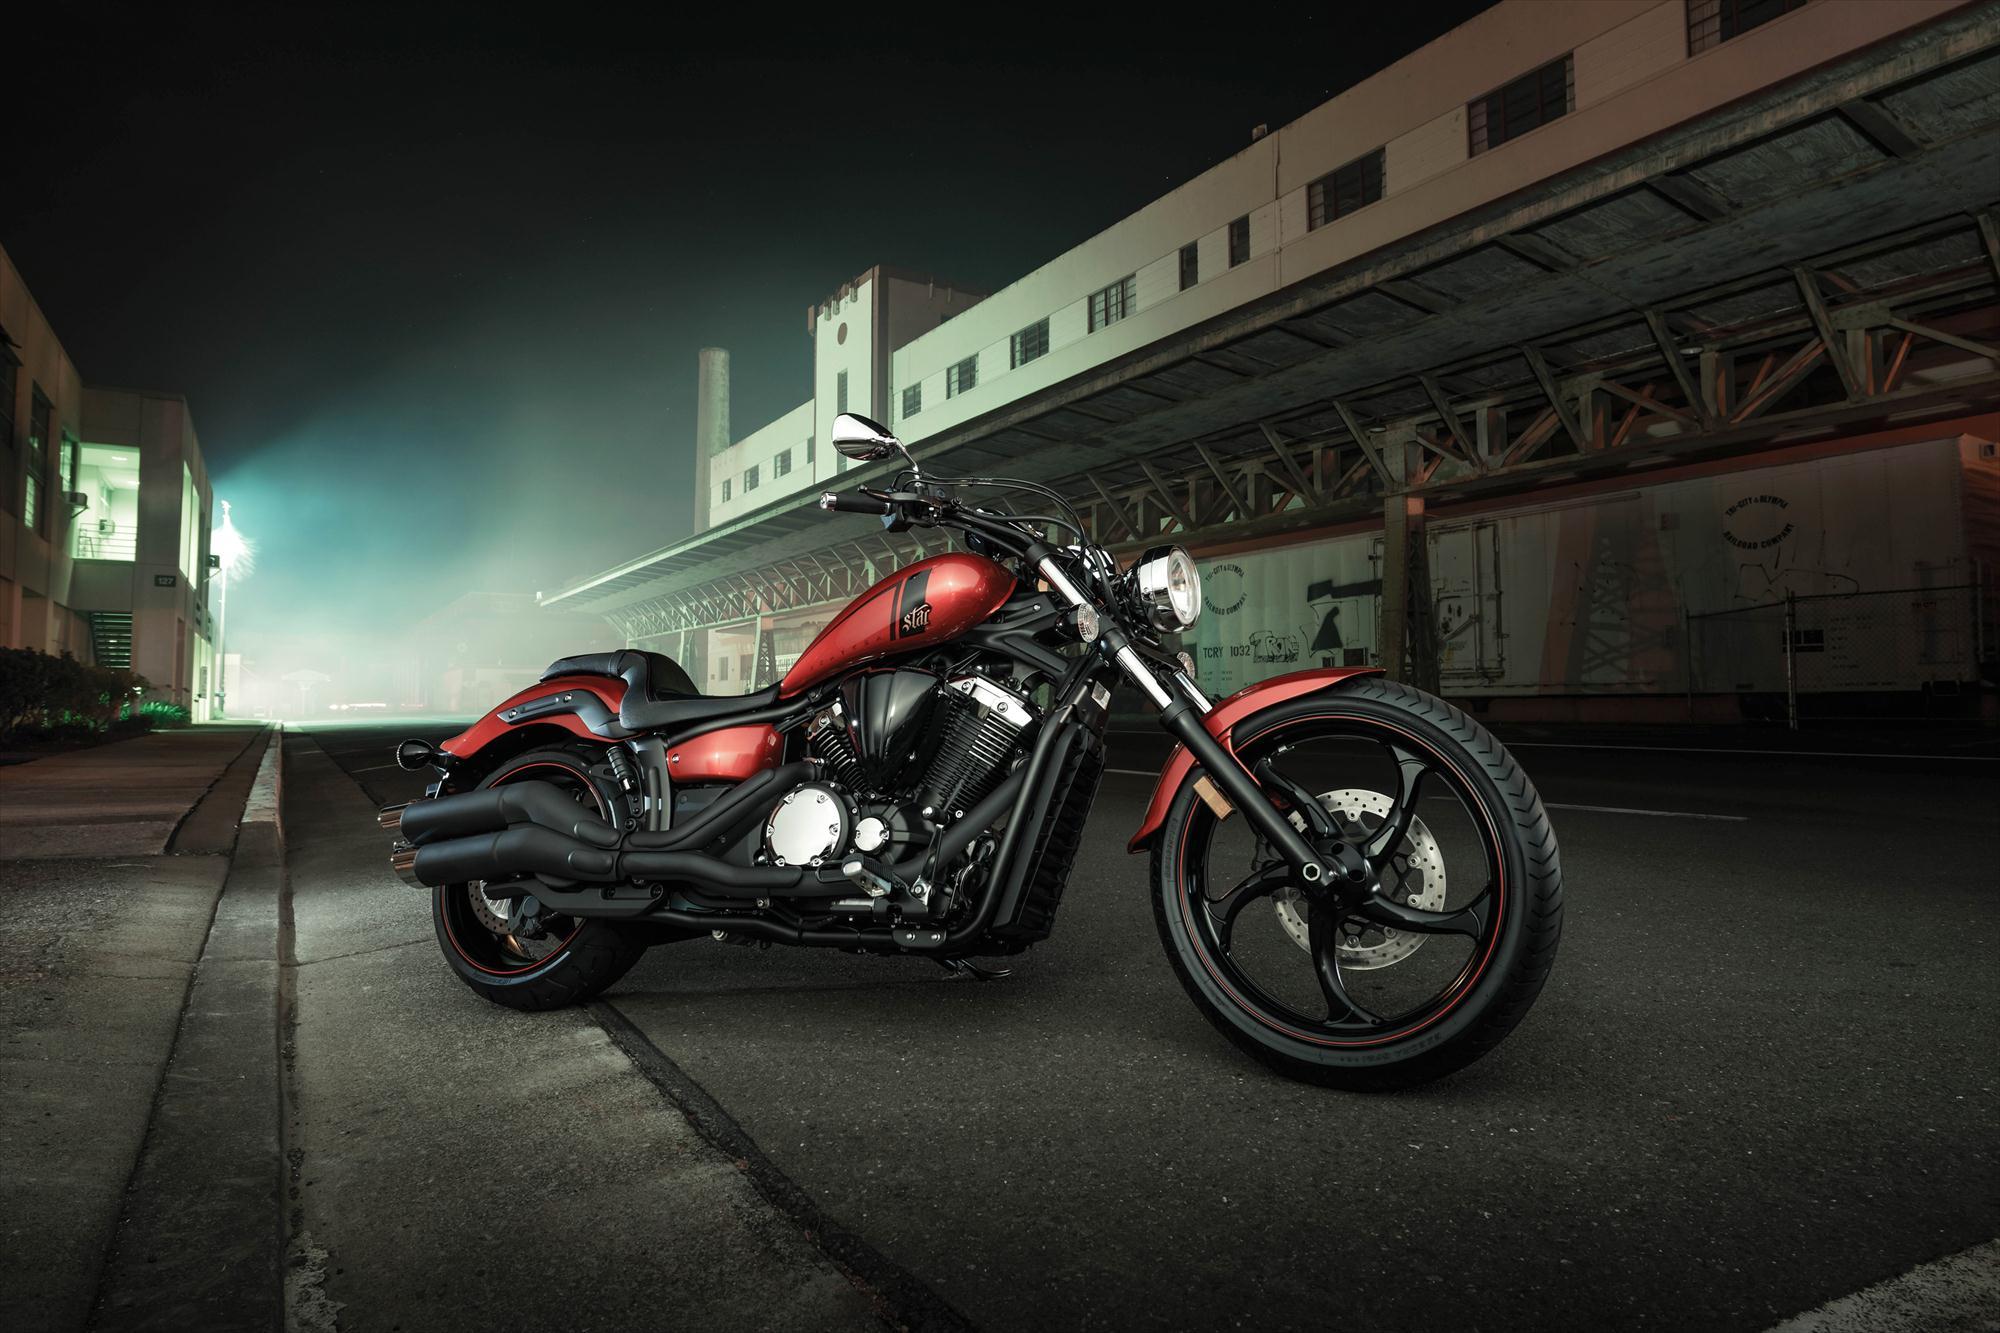 Yamaha Motorcycles Stryker Wiring Diagram Explained Diagrams Custom Wheels Royal Star Tach